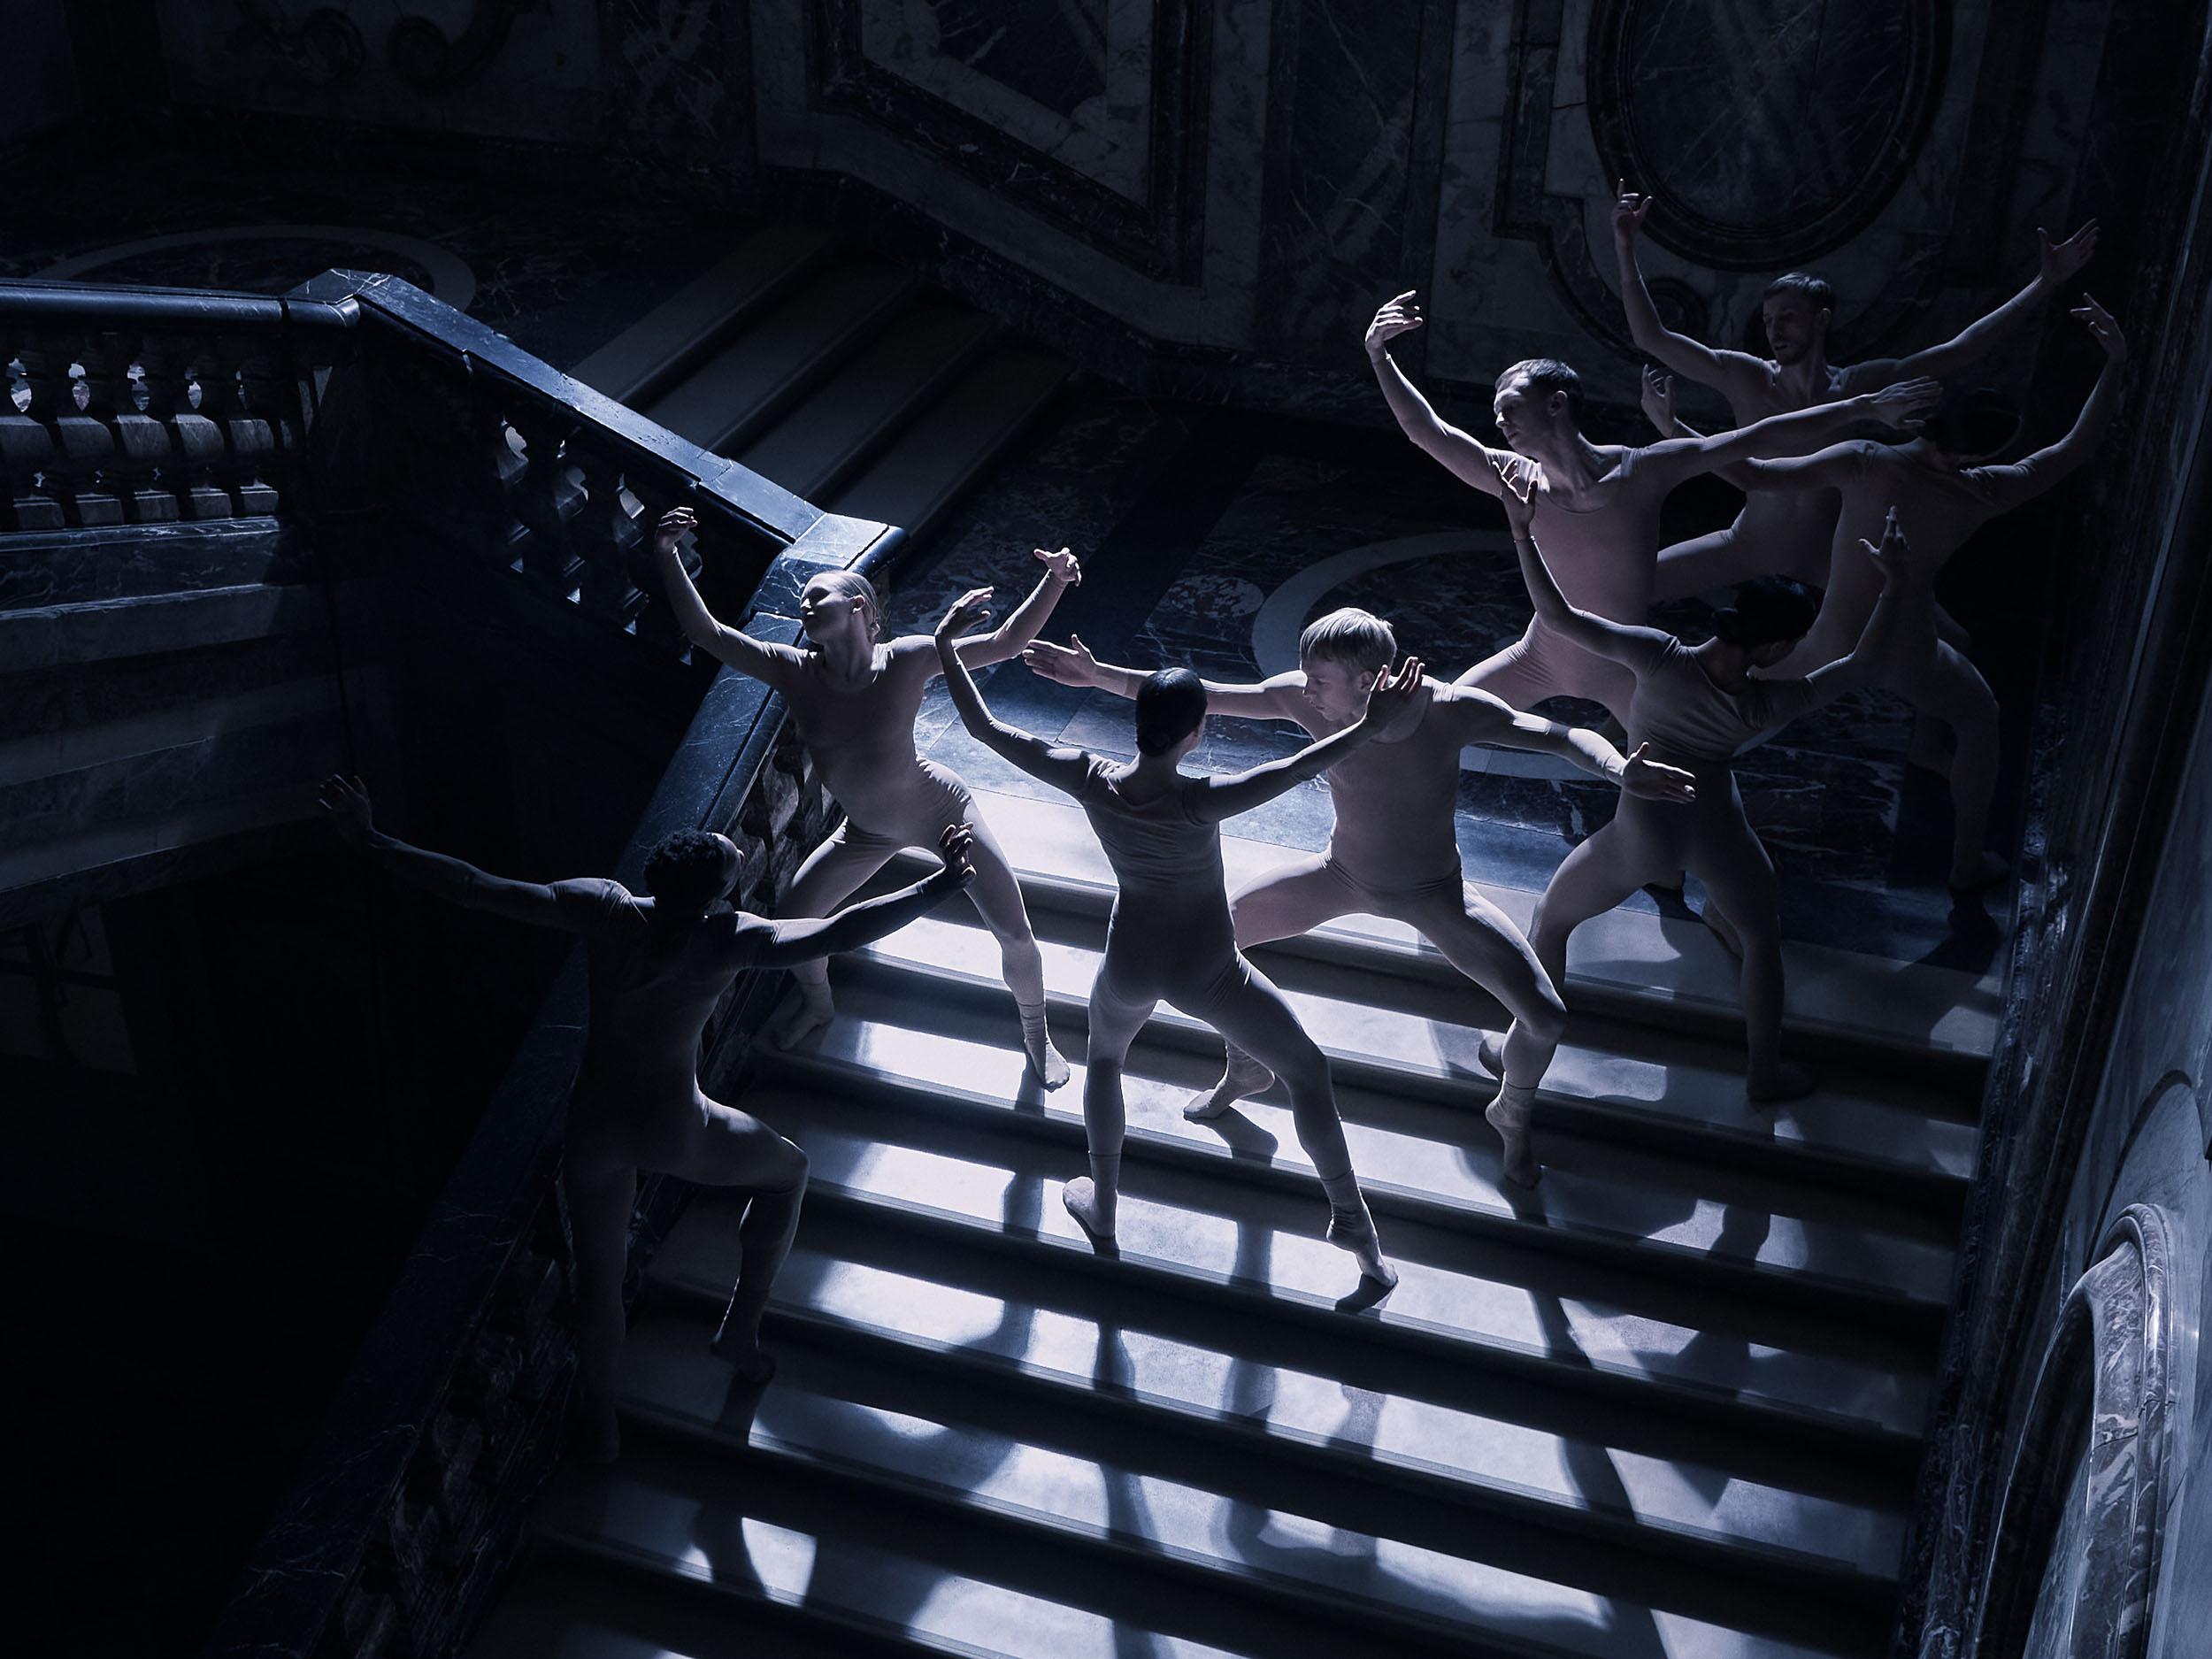 Maria Grazia Chiuri's Dior gives fairytales a modern update